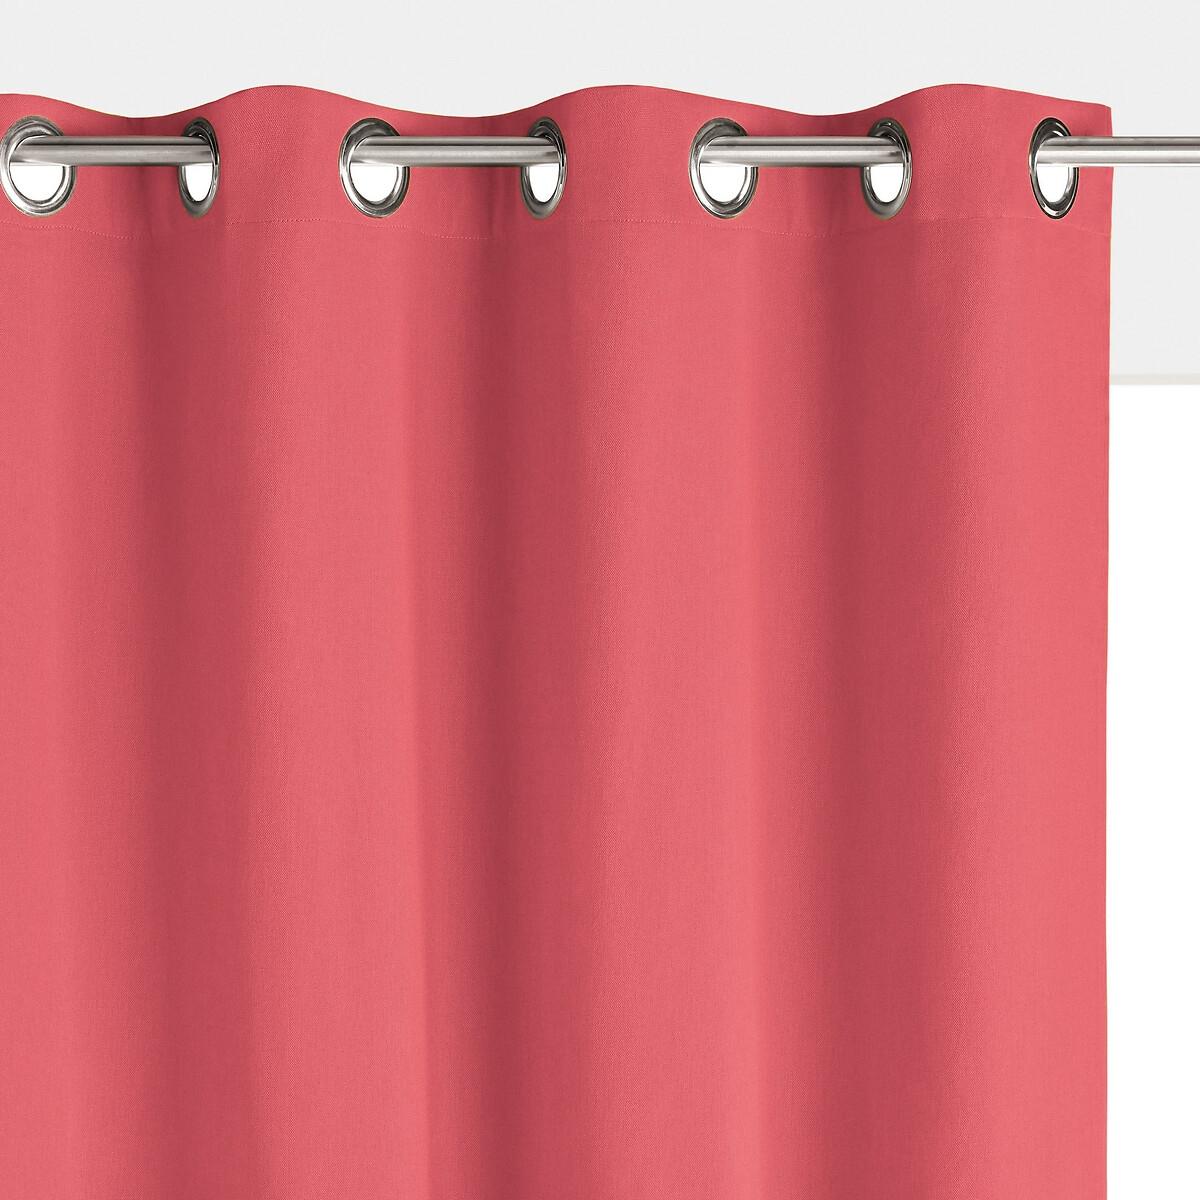 Штора LaRedoute Затемняющая с люверсами 100 хлопок Scenario 220 x 135 см розовый